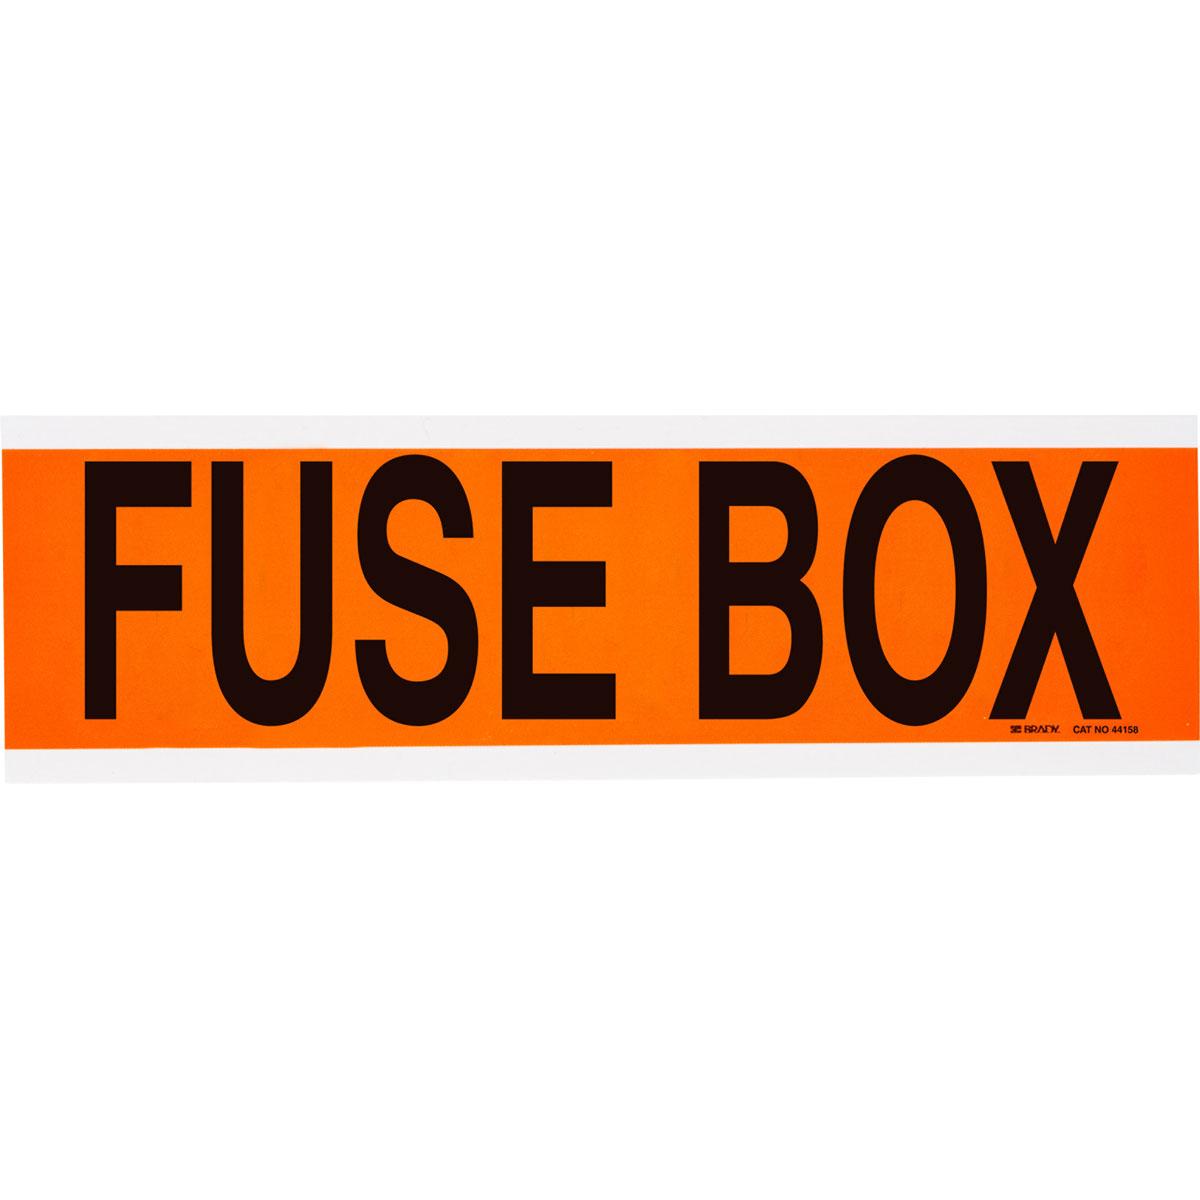 brady part 44158 fuse box label bradyid com rh bradyid com fuse box panel labels house fuse box labels